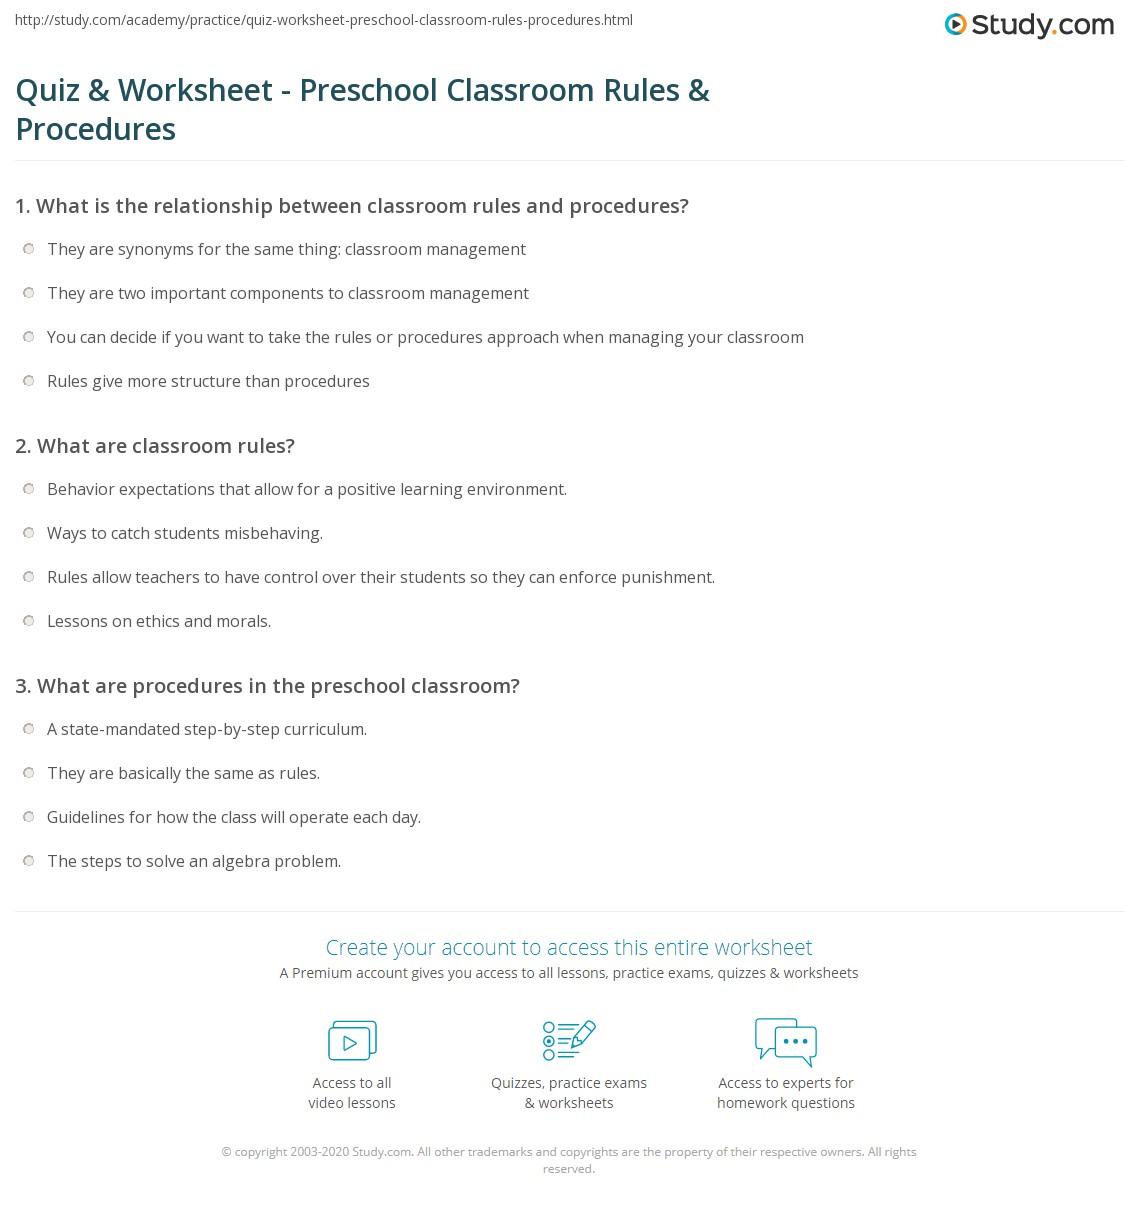 quiz worksheet preschool classroom rules procedures. Black Bedroom Furniture Sets. Home Design Ideas